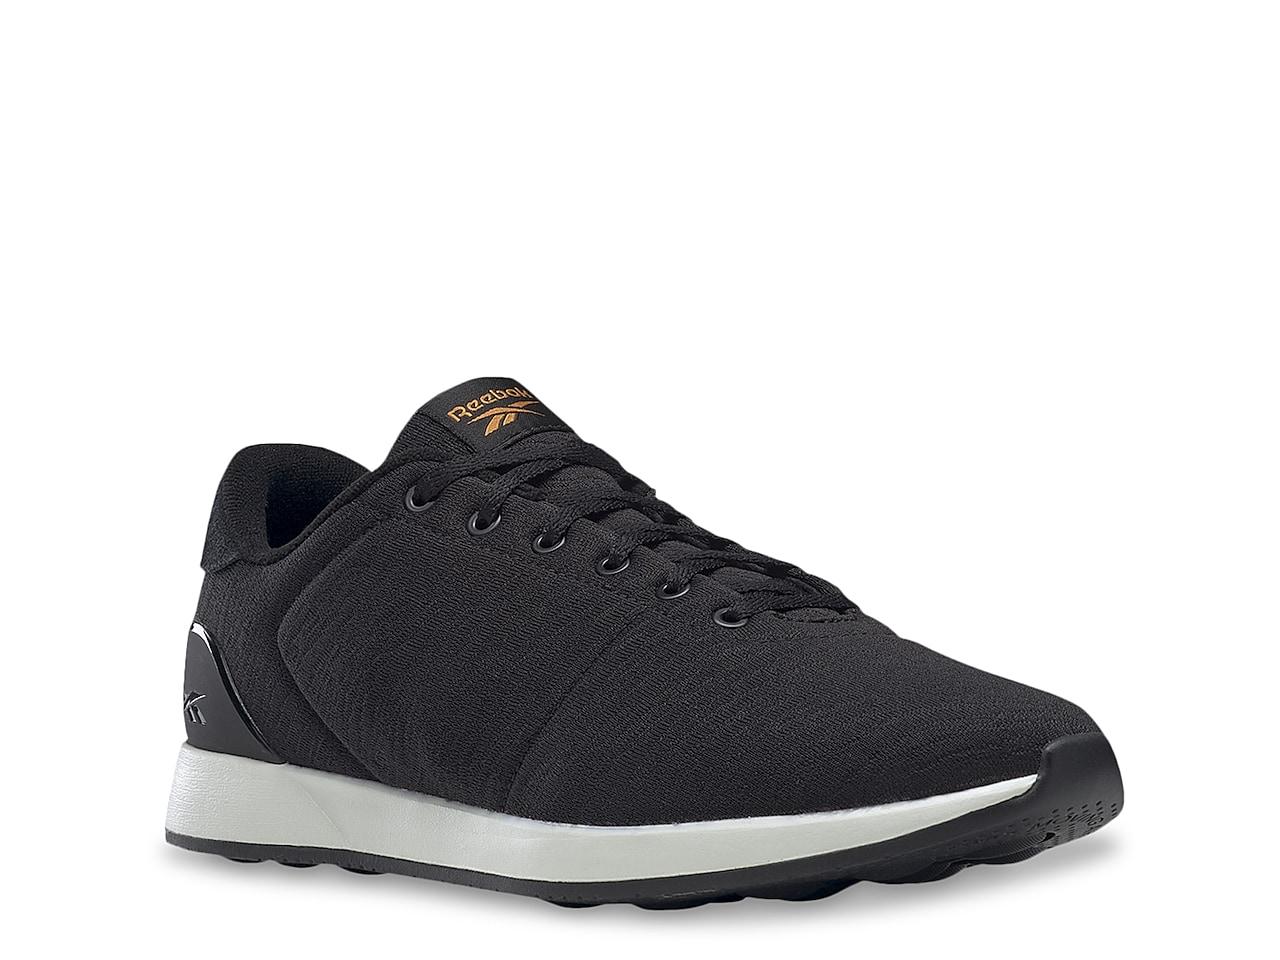 Reebok Ever Road DMX 4.0 Walking Shoe - Men's